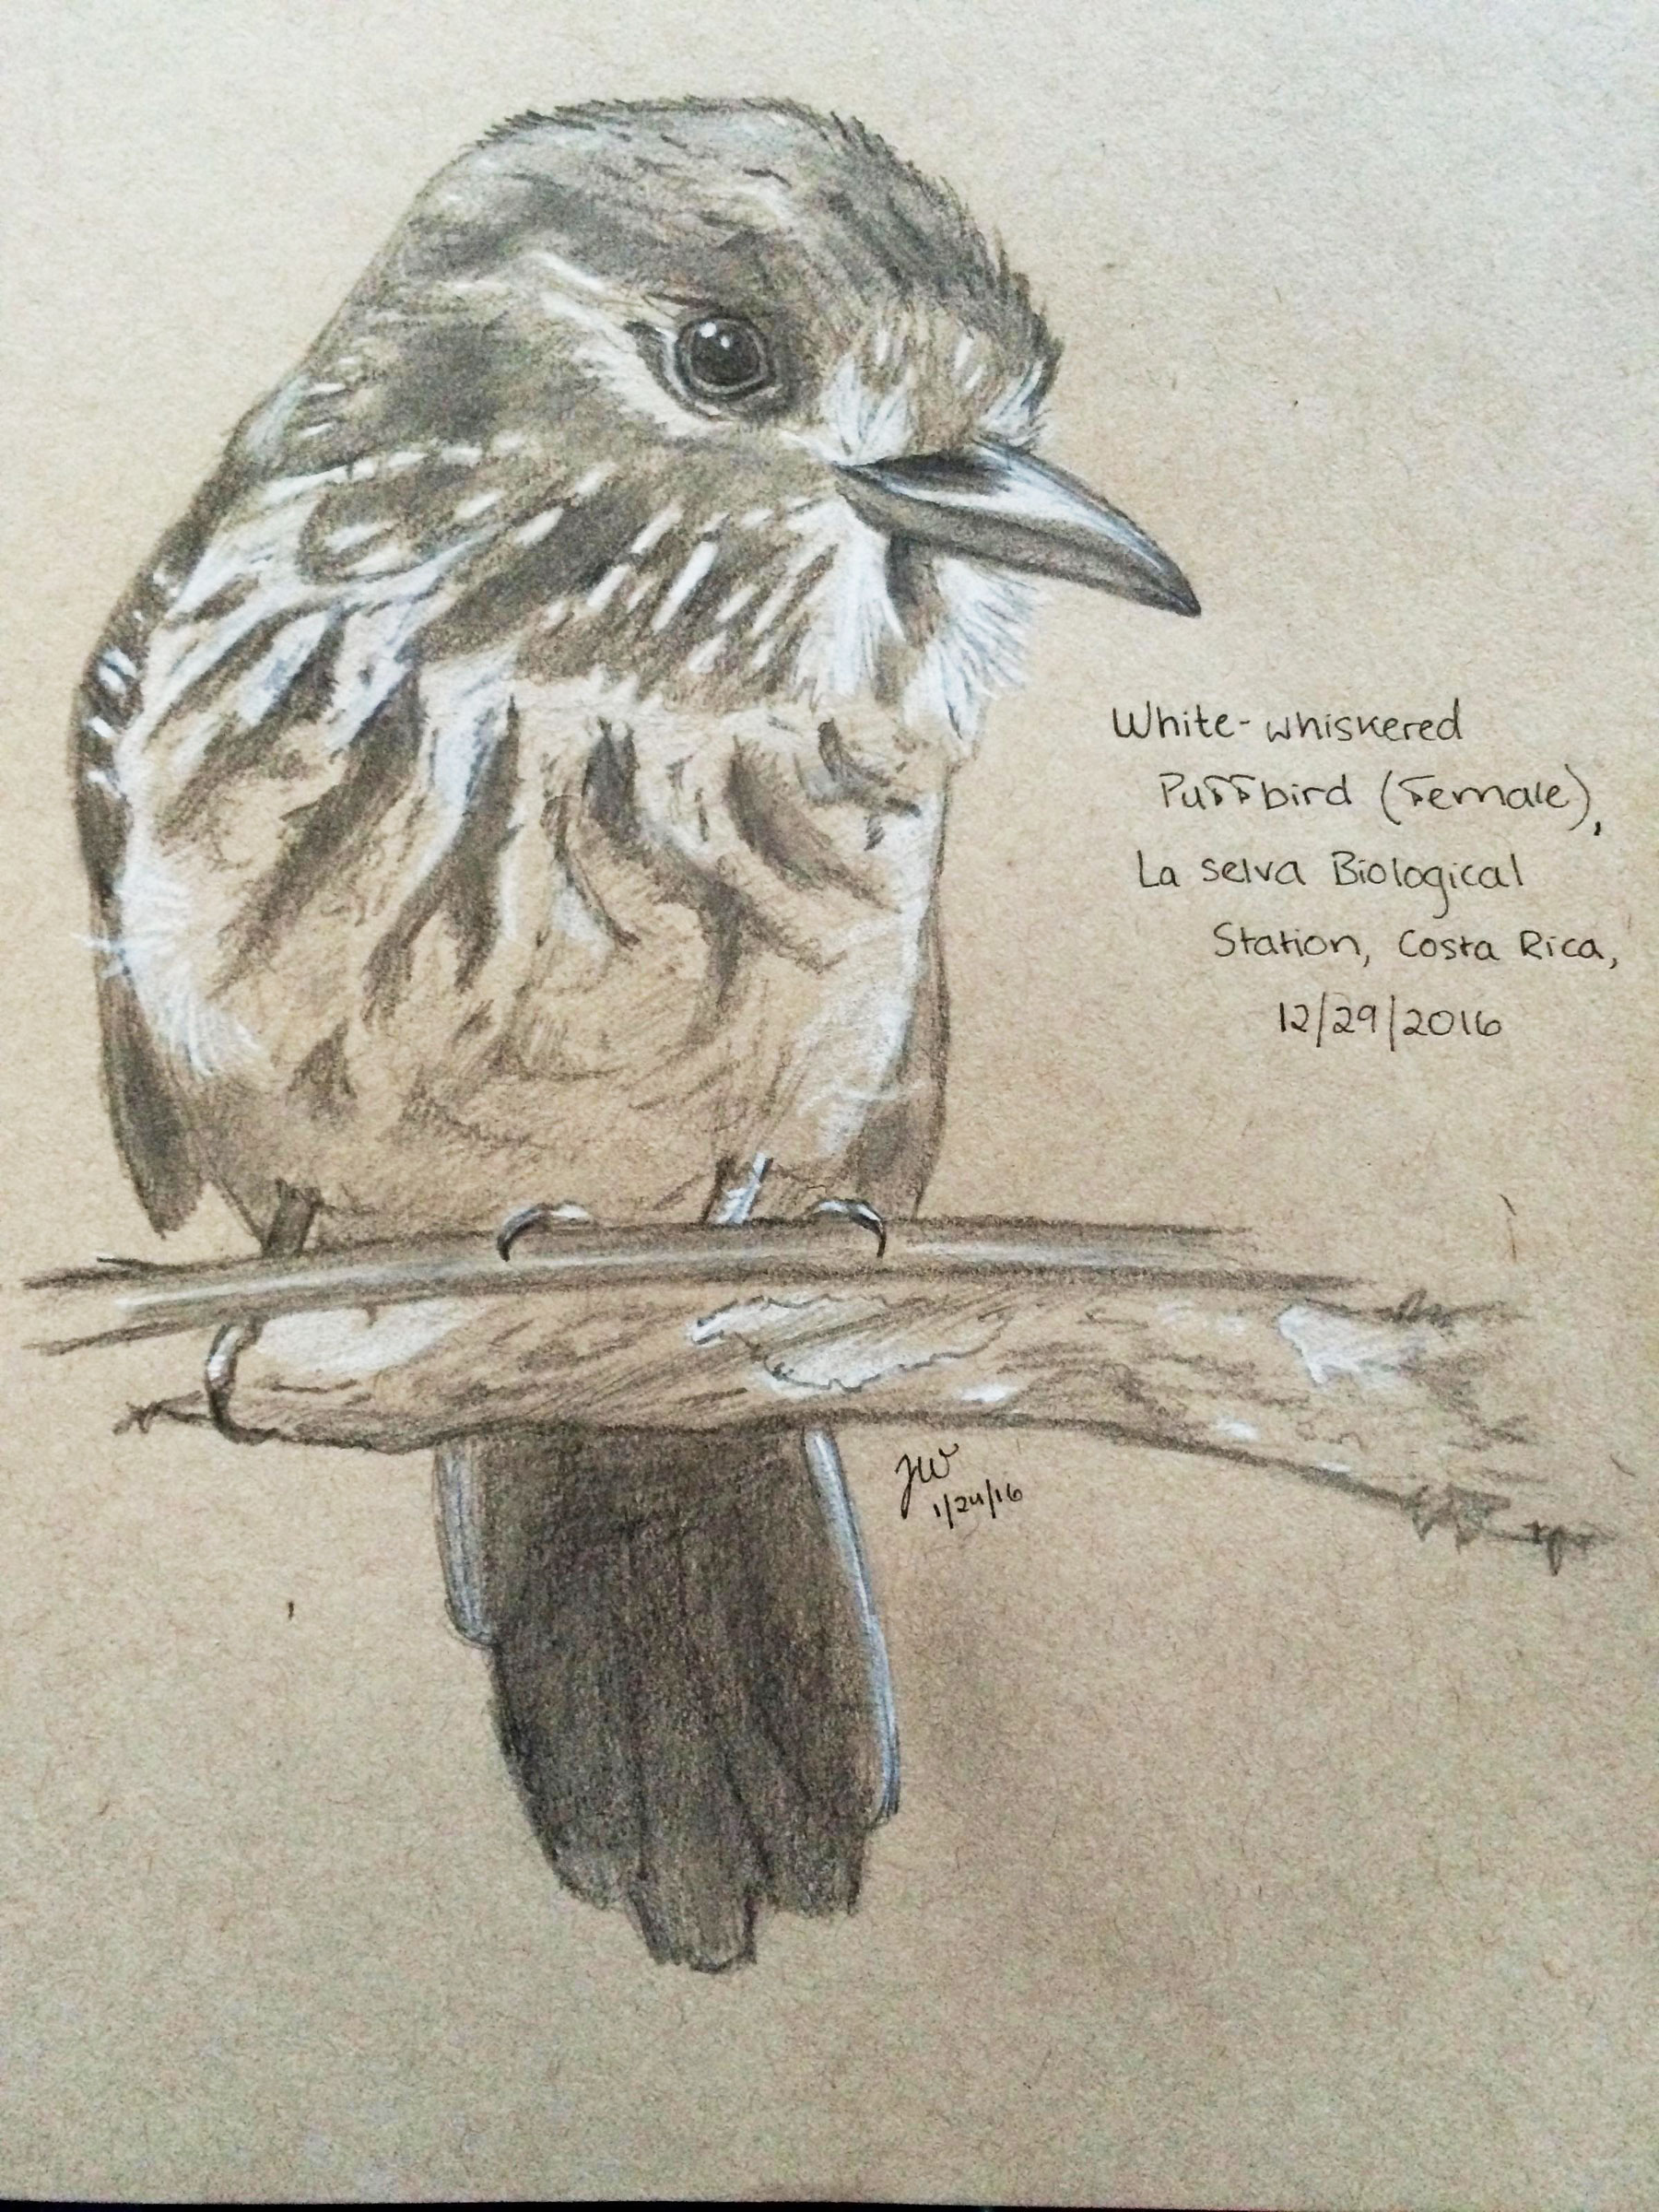 White-whiskered Puffbird. Illustration: Josh Ward